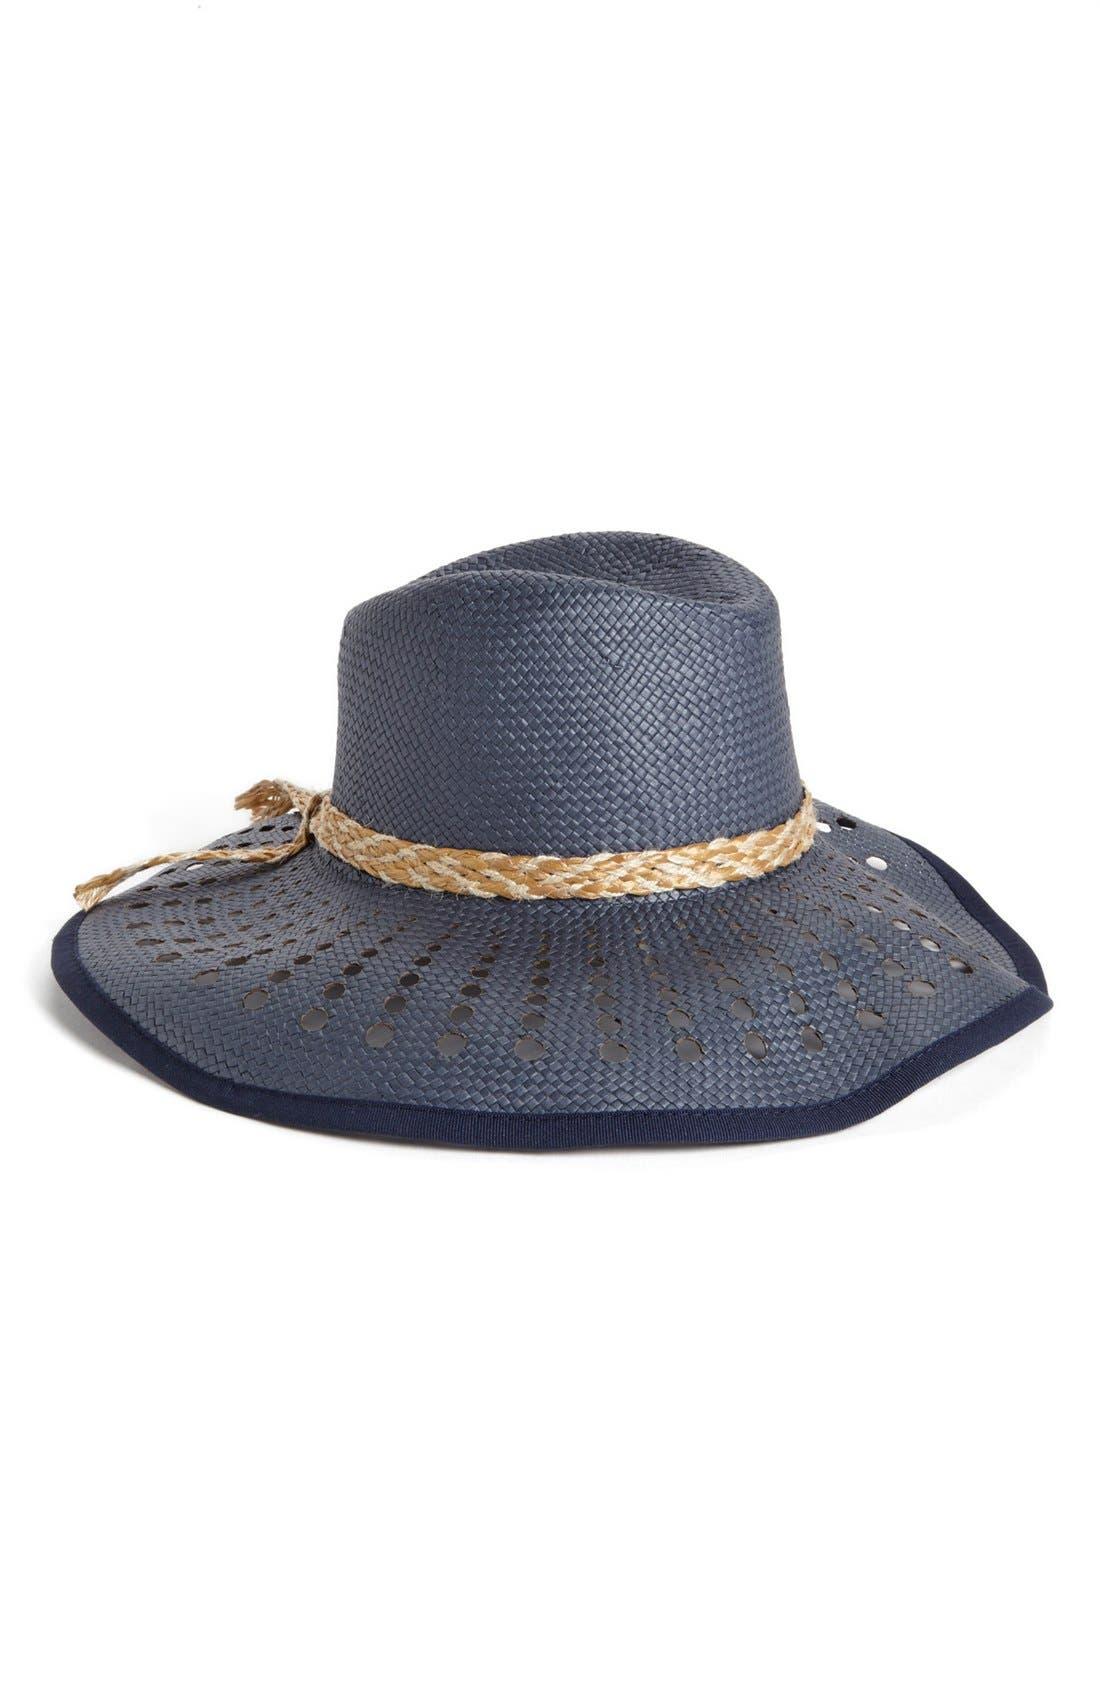 Alternate Image 1 Selected - Nordstrom 'Holey' Floppy Hat